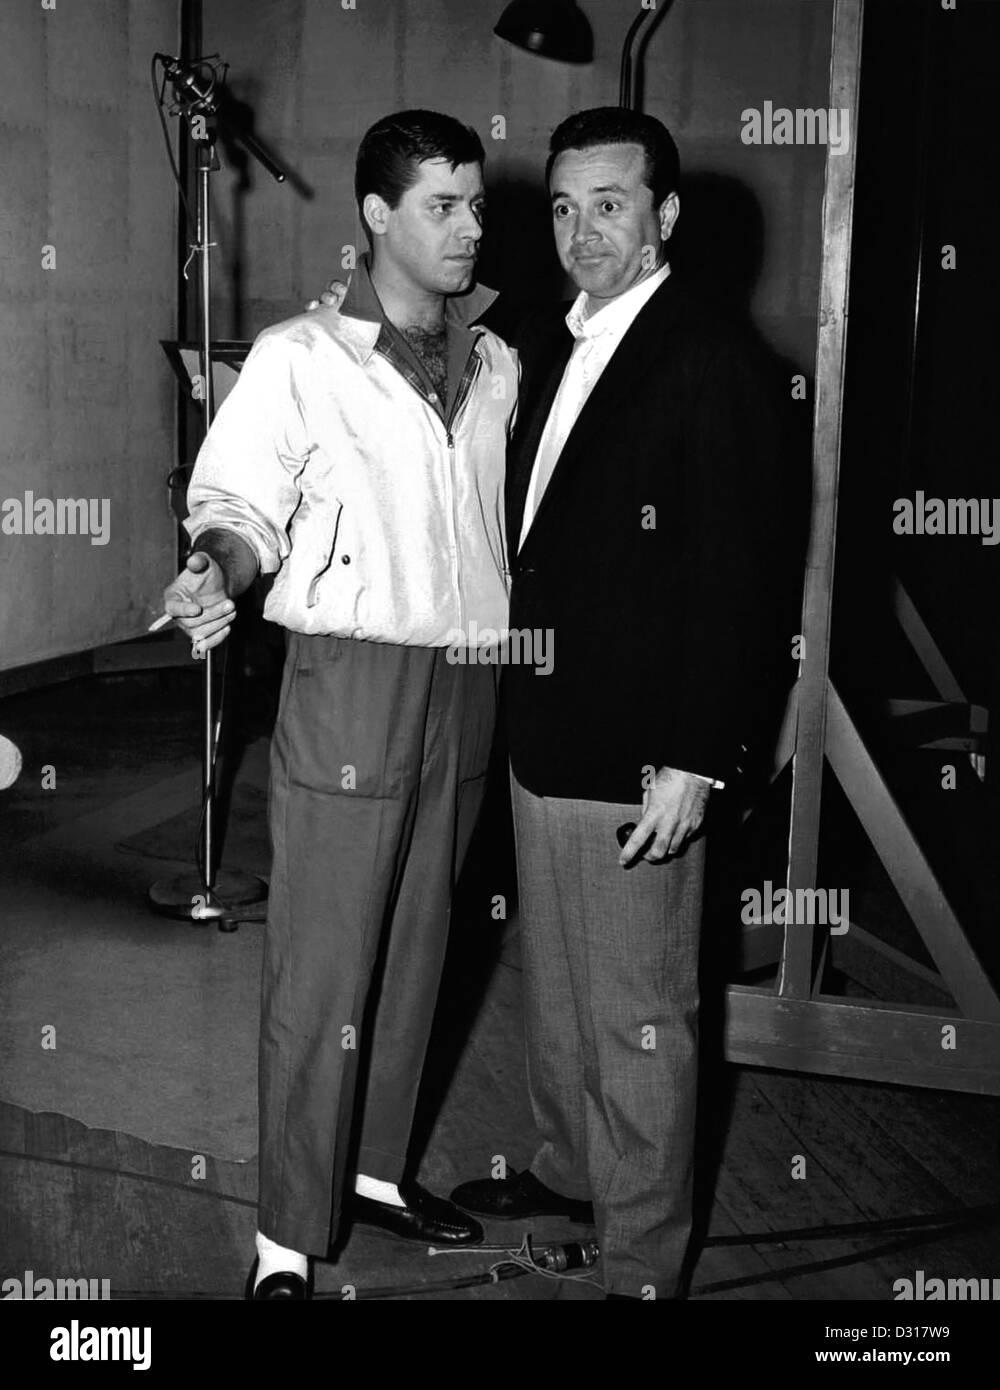 Jerry Lewis, Vic Damone - Stock Image